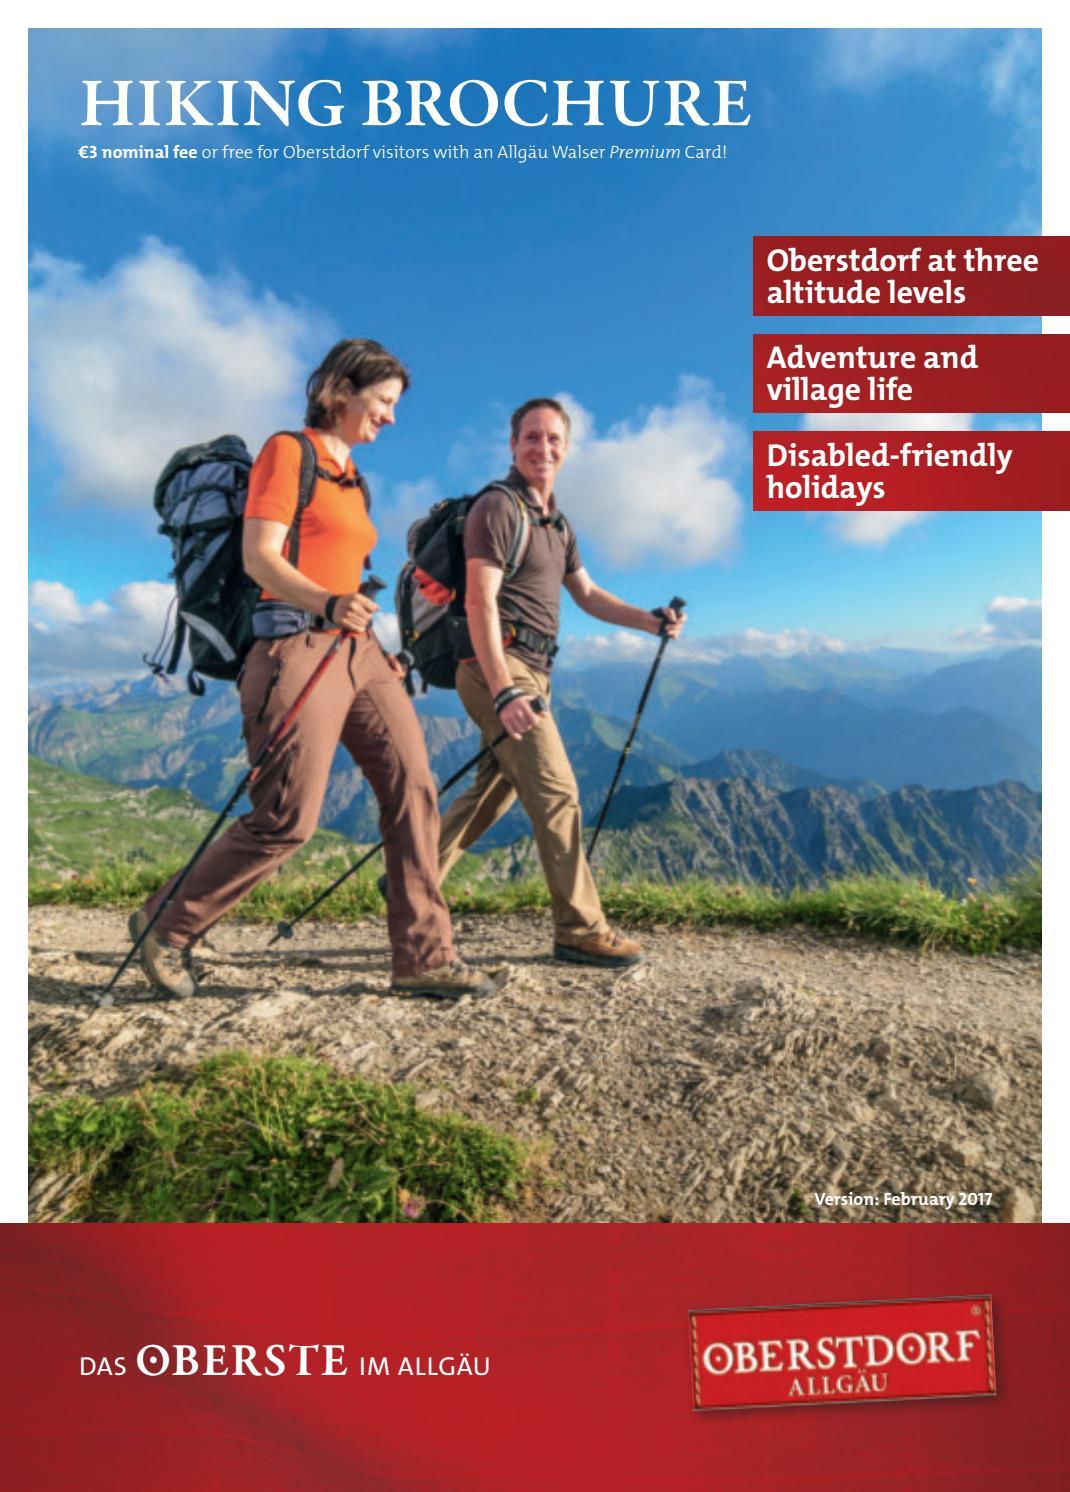 Oberstdorf Hiking Brochure 2017 by Tourismus Oberstdorf - issuu